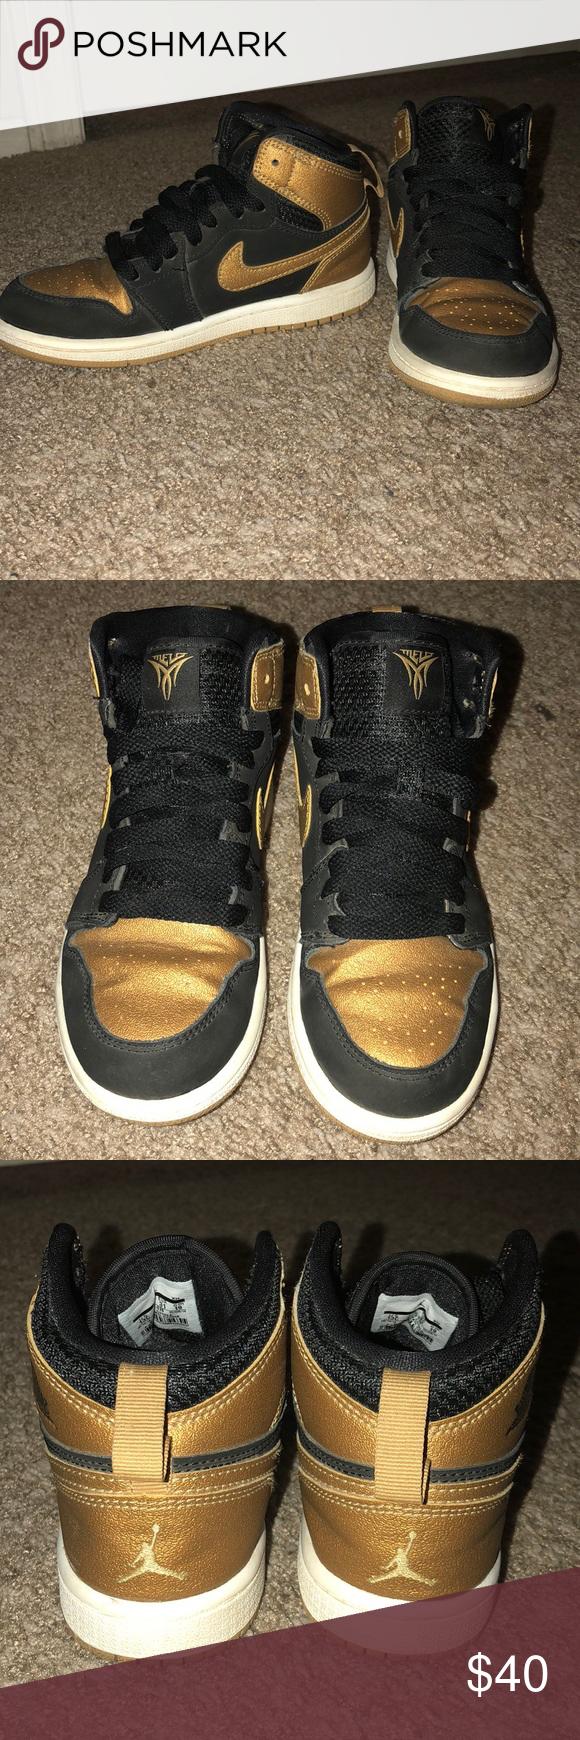 Air Jordan Retro 1 Black, Metallic Gold